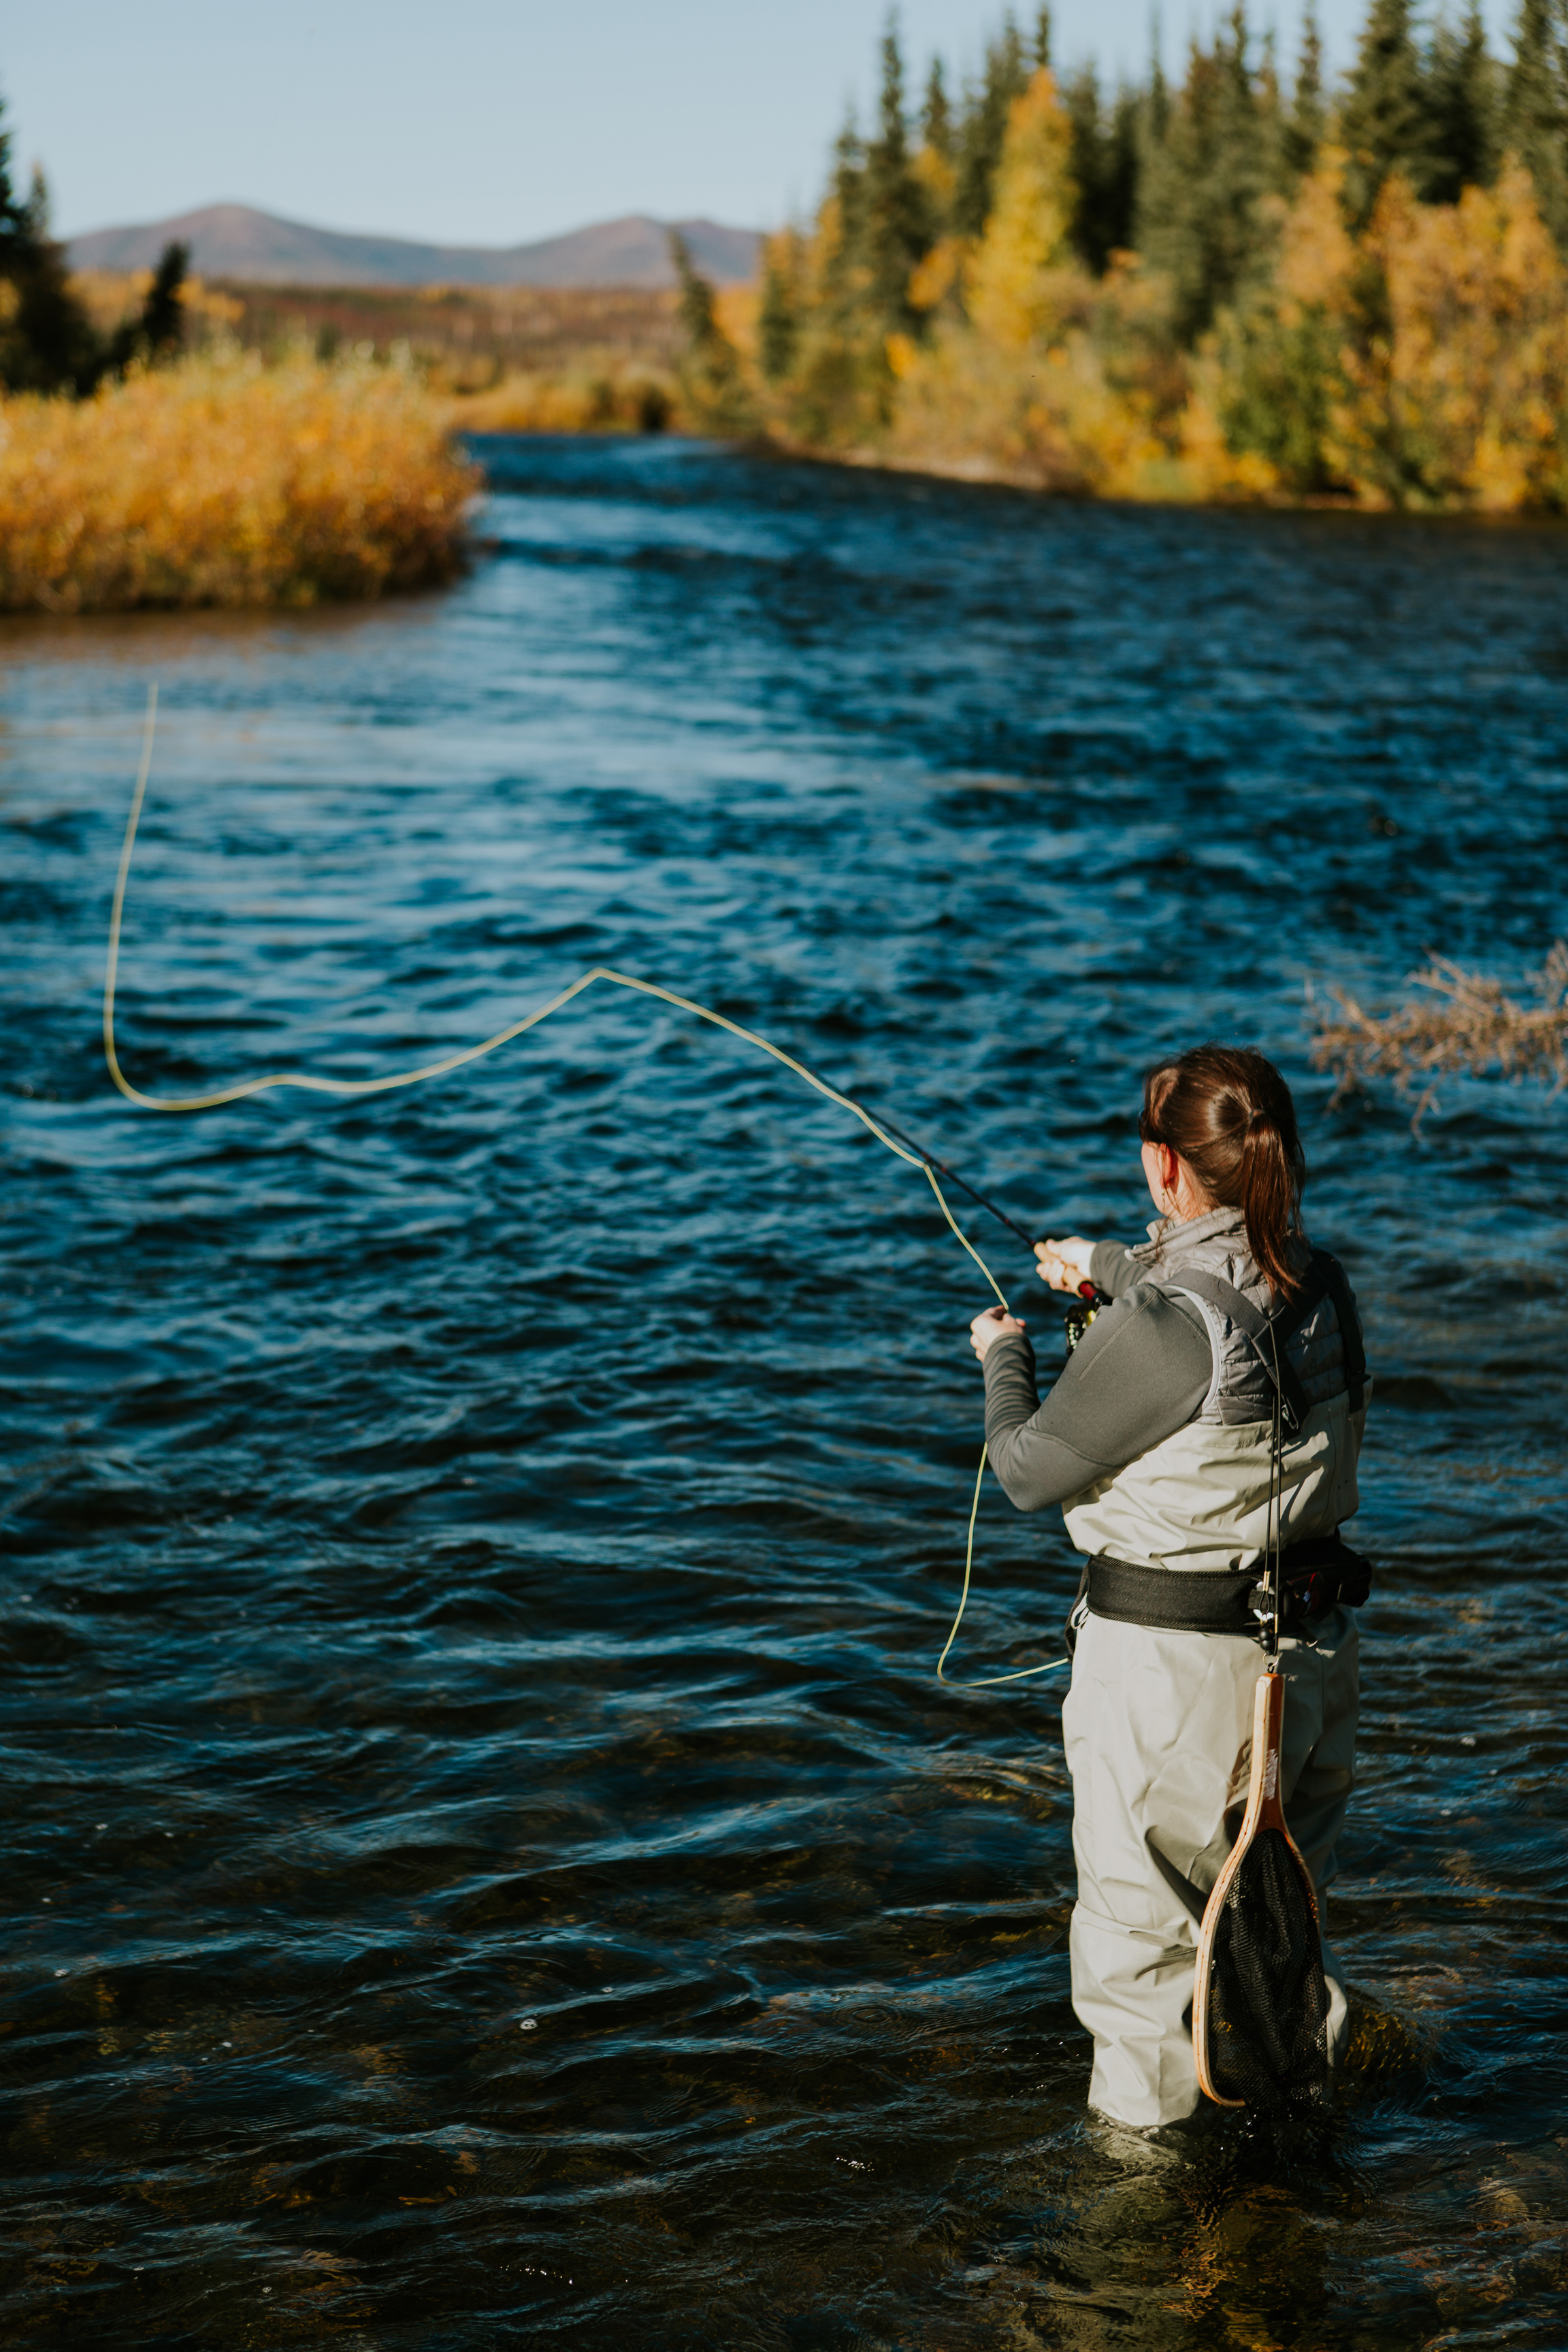 CindyGiovagnoli_Alaska_KoyukukRiver_SukakpakMountain_JimRiver_ArcticCircle_fly_fishing_September-060.jpg